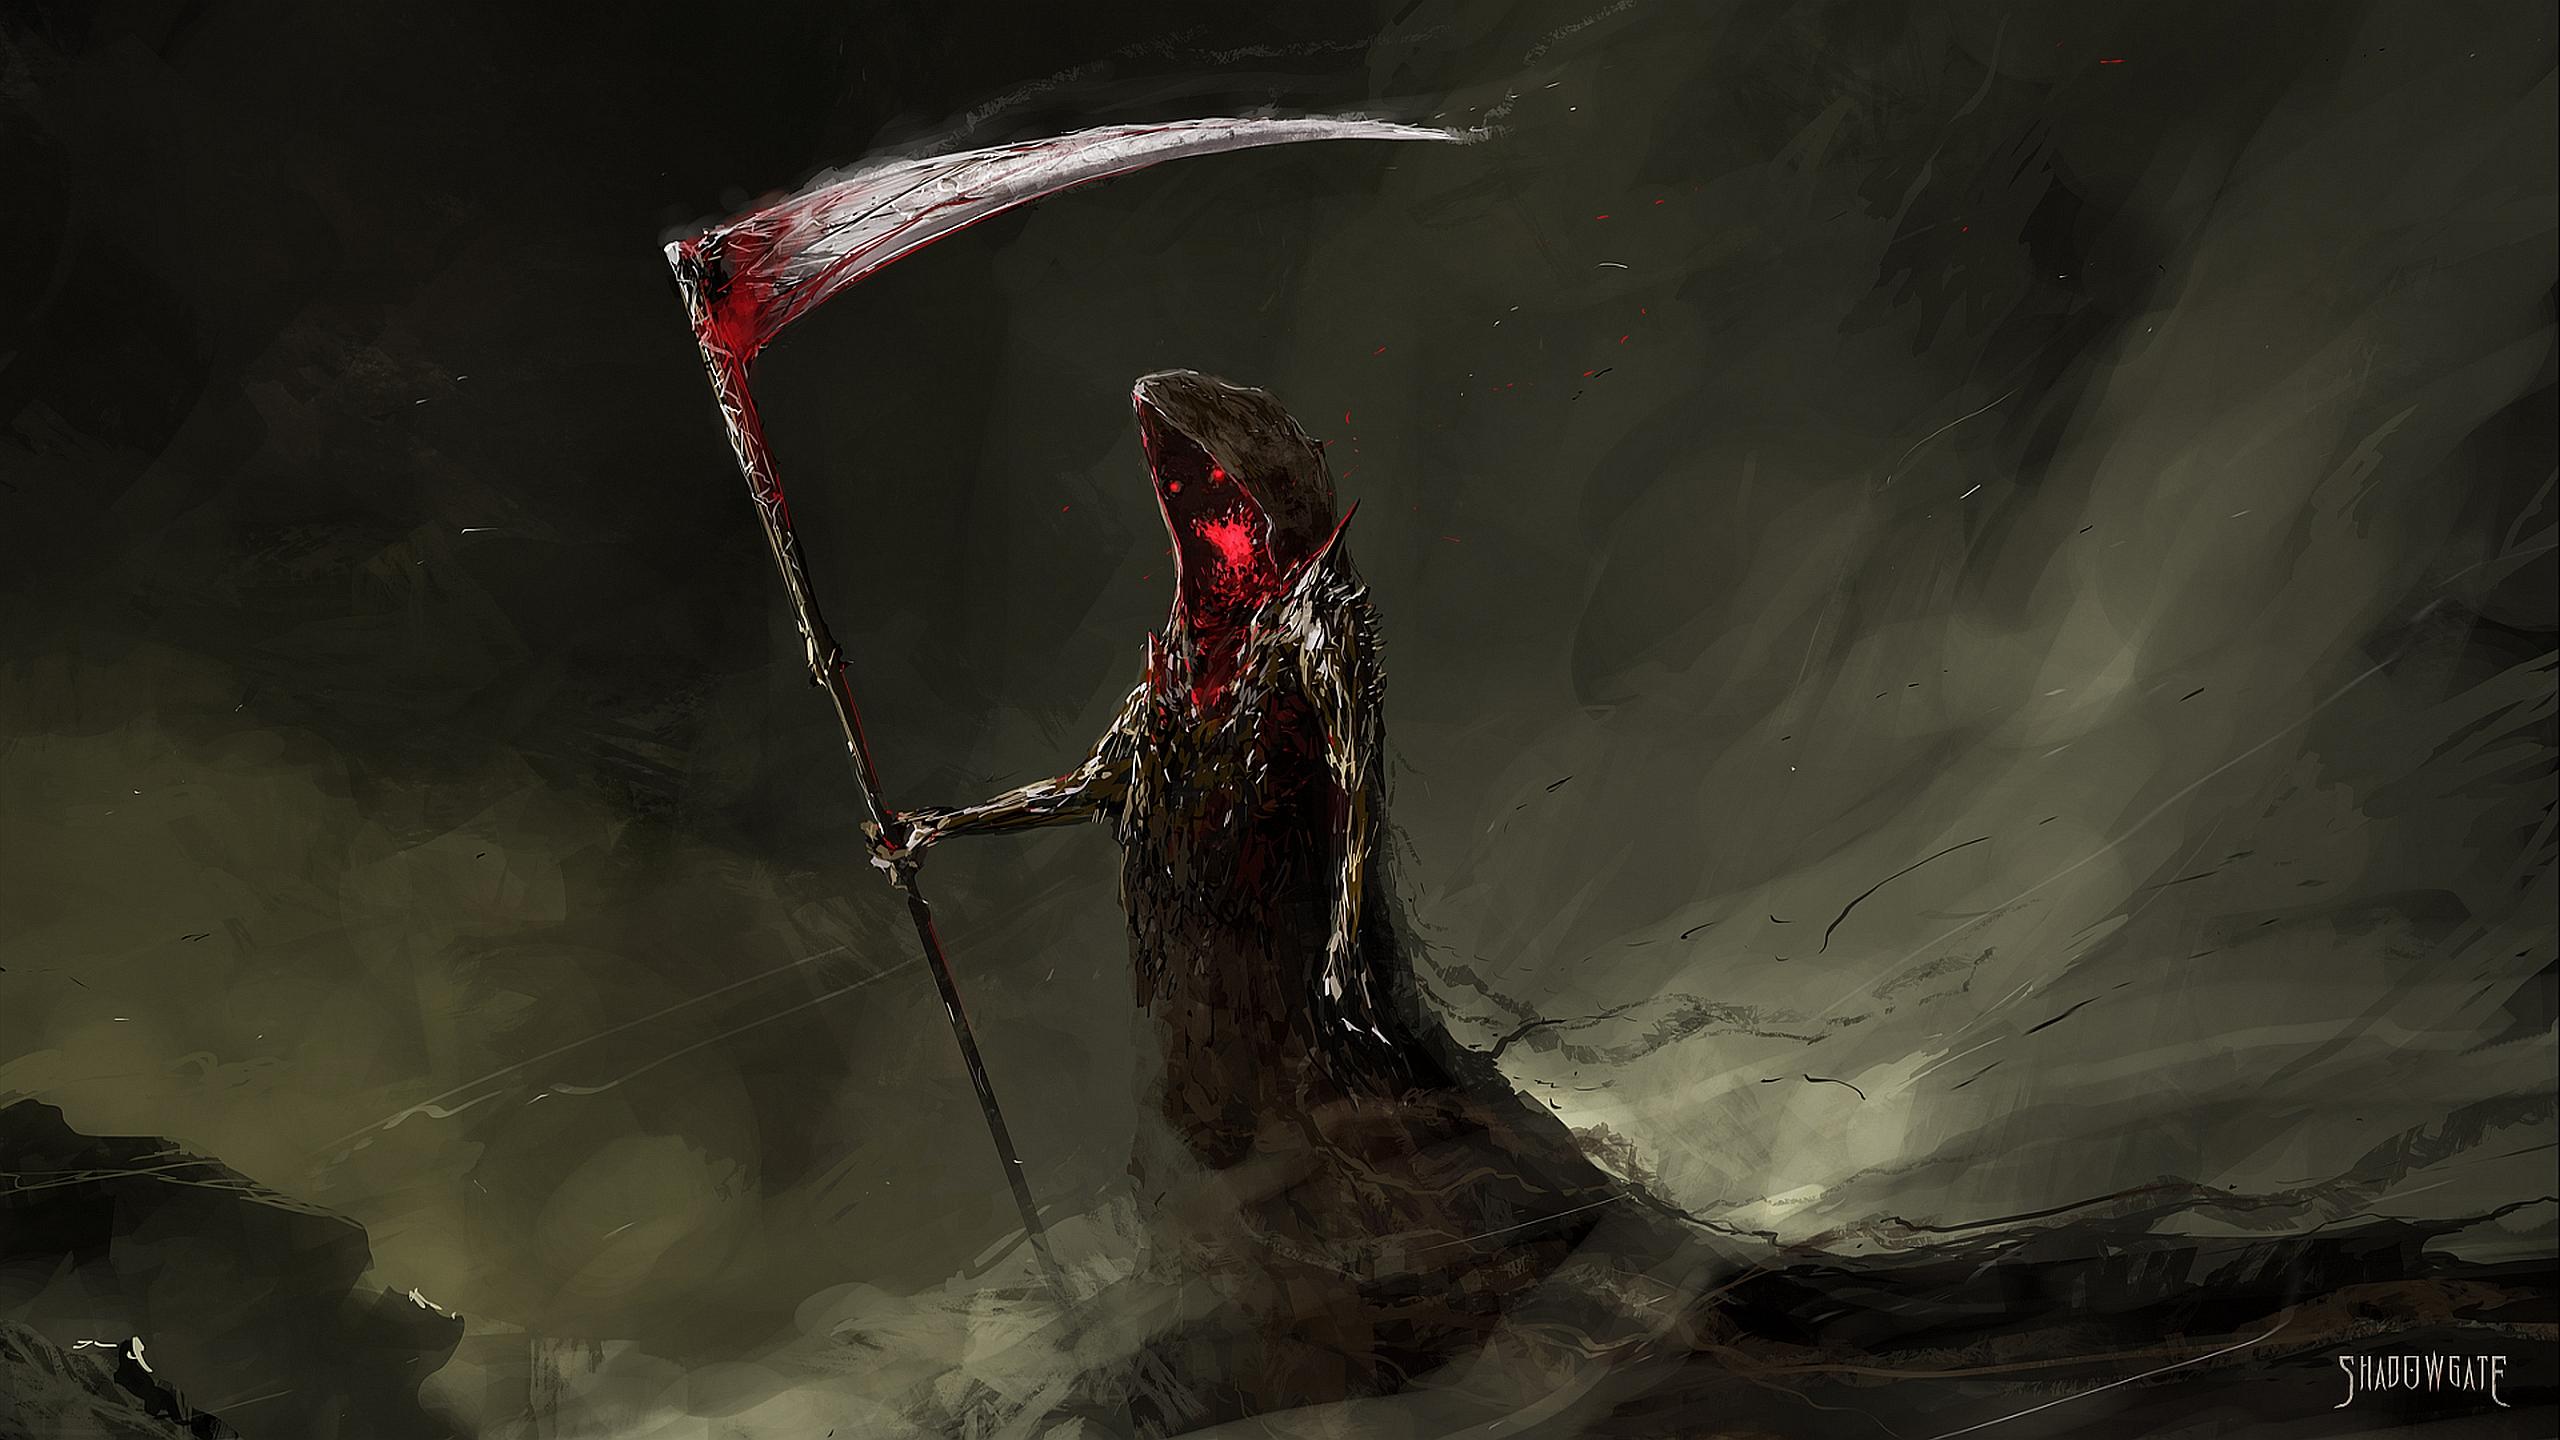 Dark Fantasy Grim Reaper Wallpaper Resolution 2560x1440 Id 454296 Wallha Com